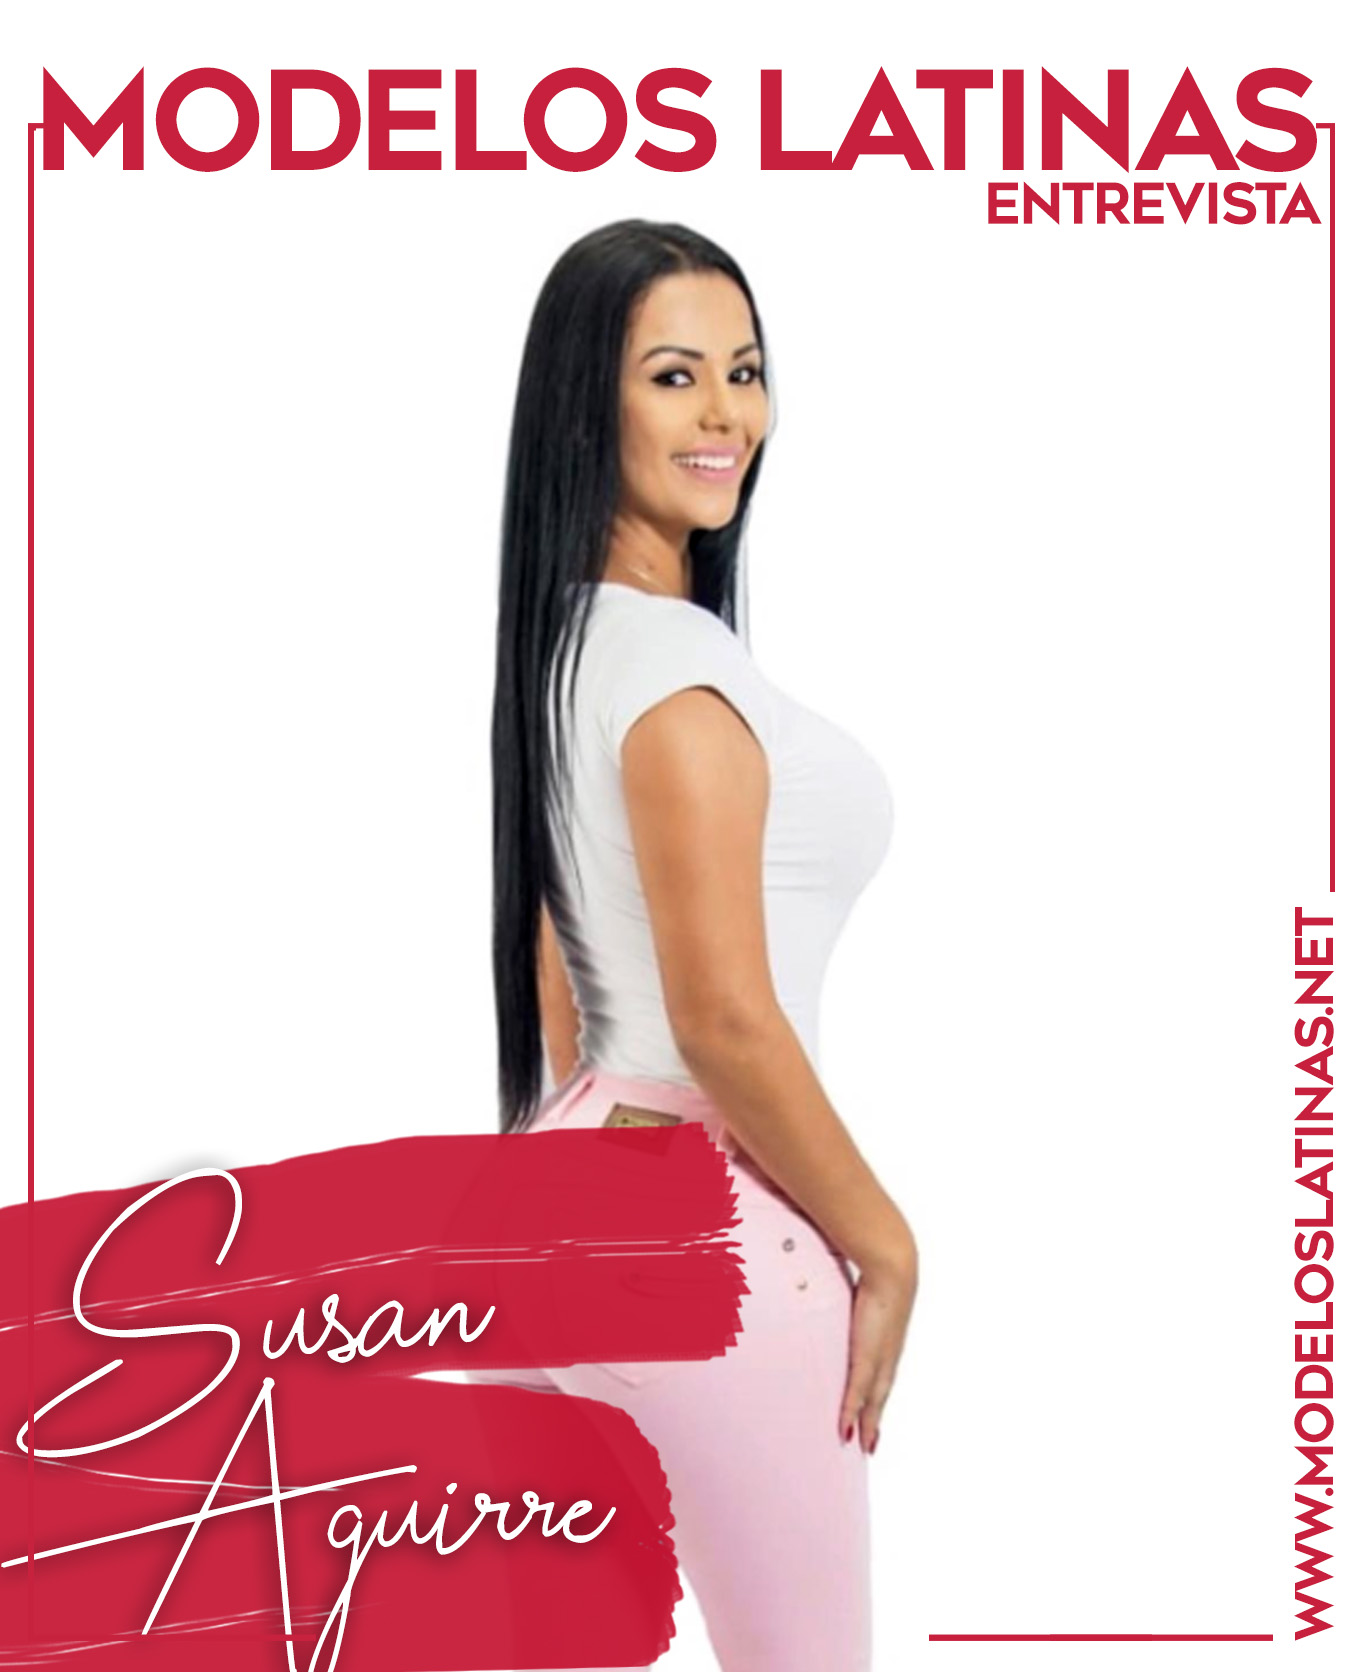 Susan Aguirre